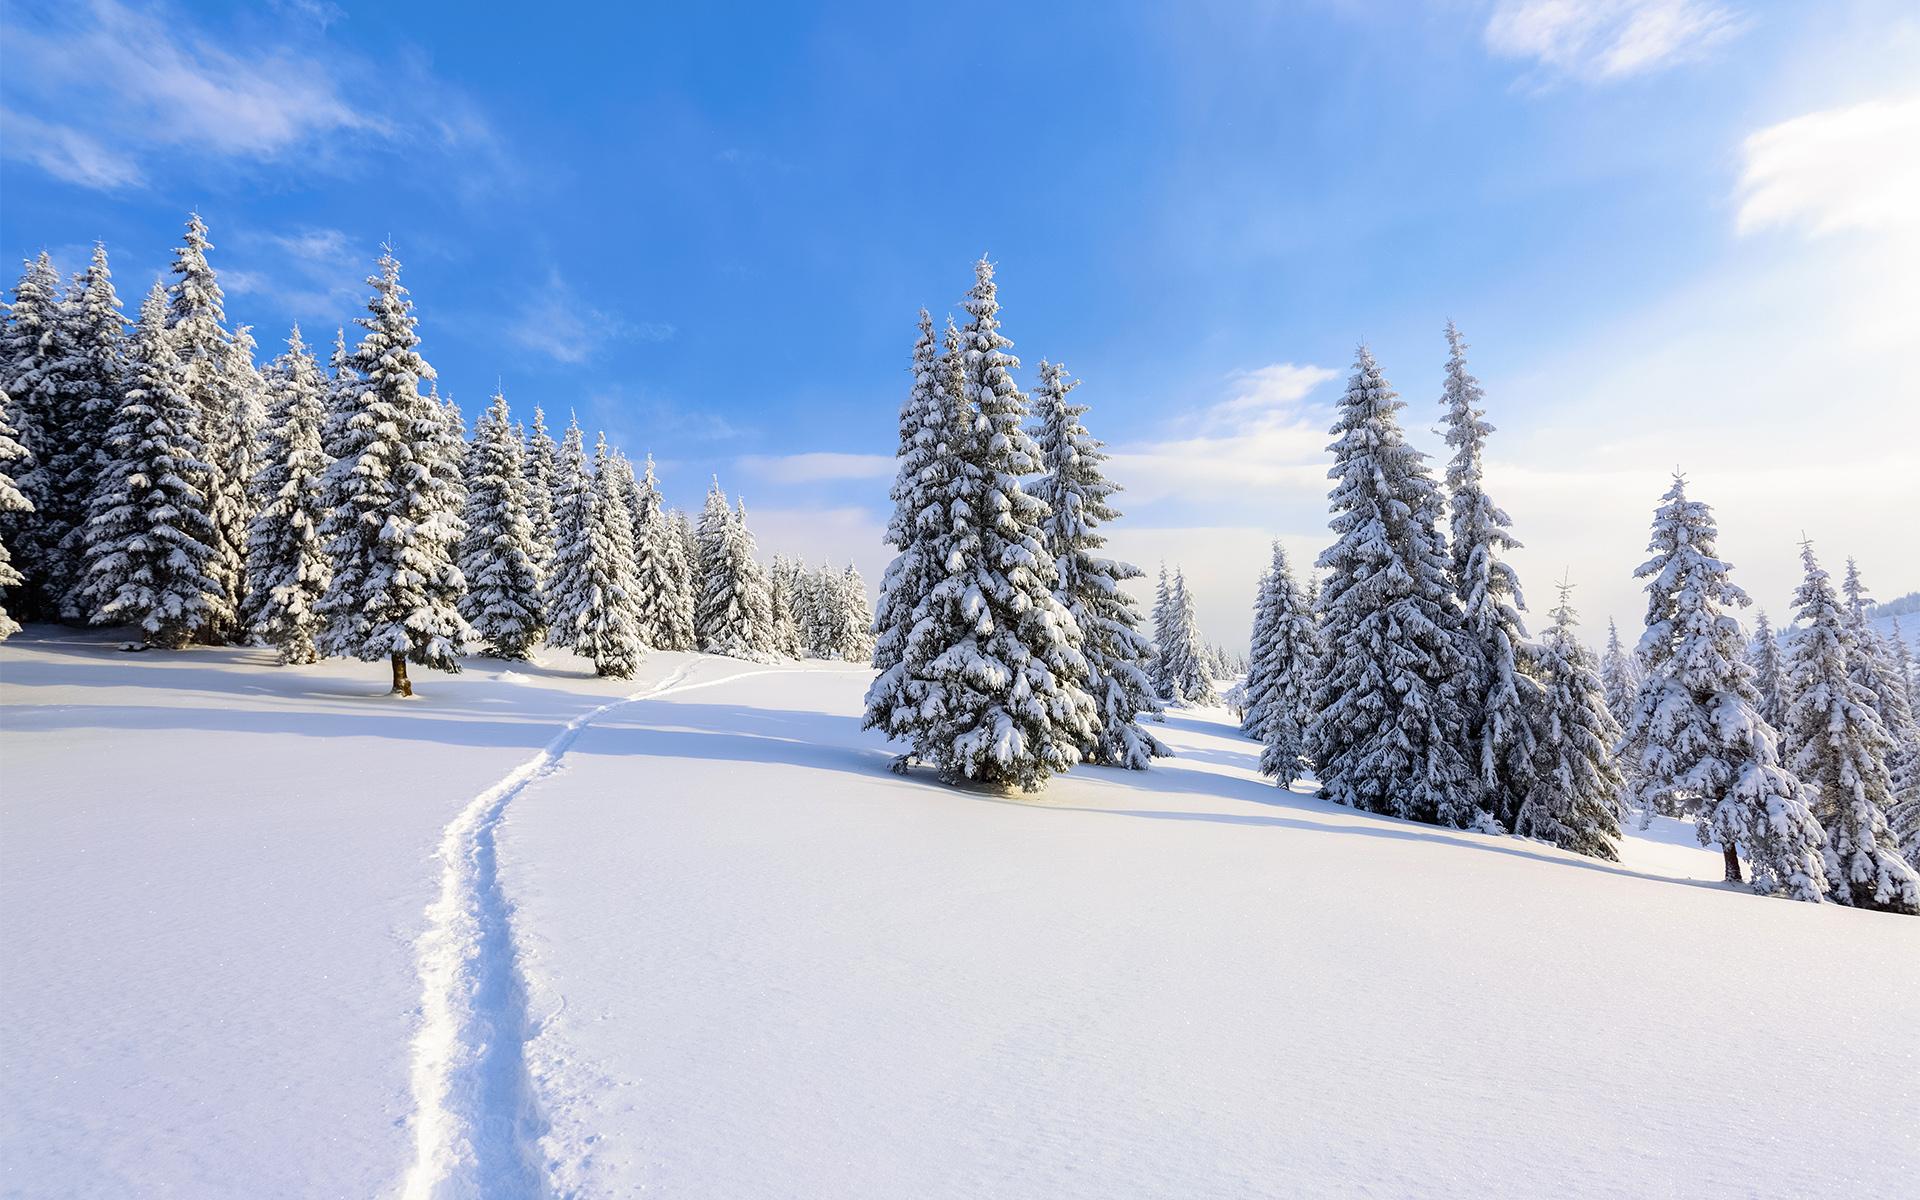 trace-dans-la-neige-montagne